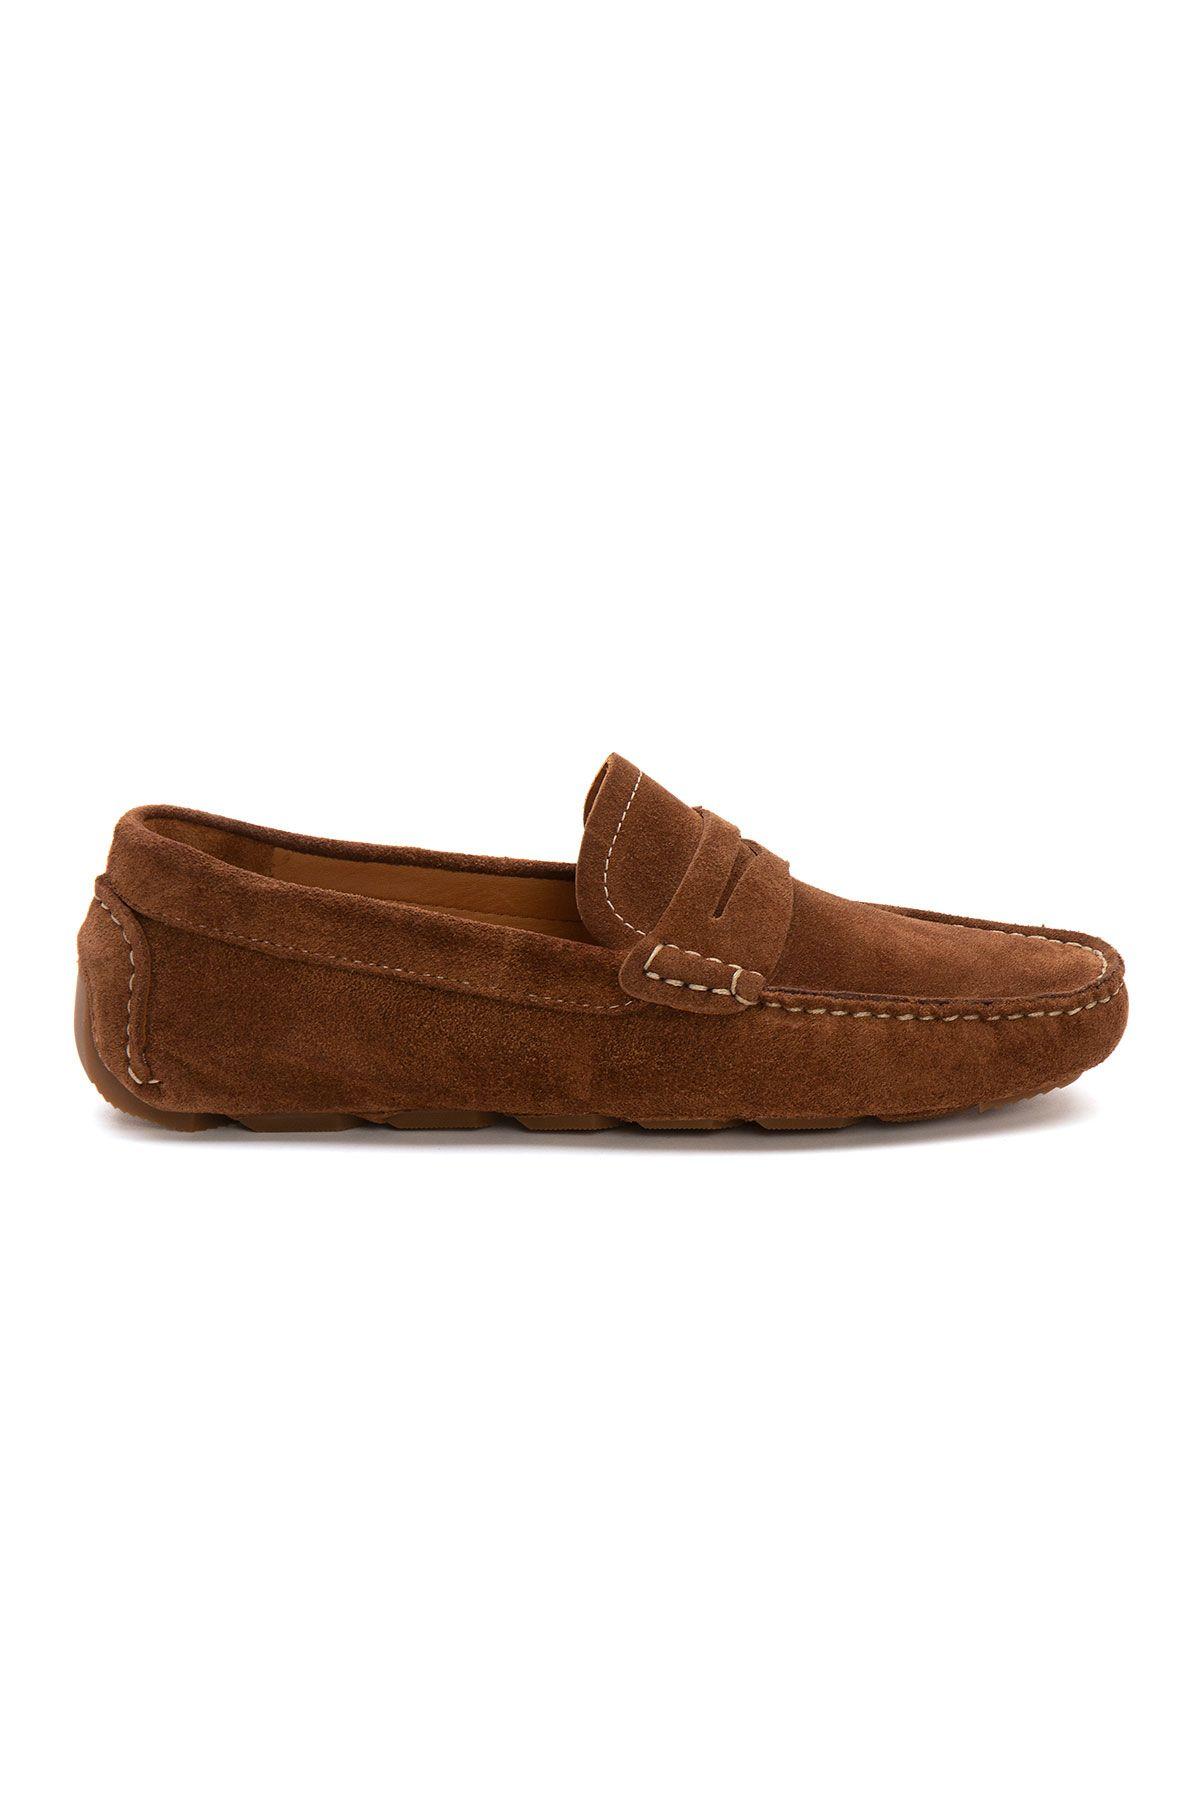 Pegia Genuine Suede Men's Loafer Shoes 500901 Ginger